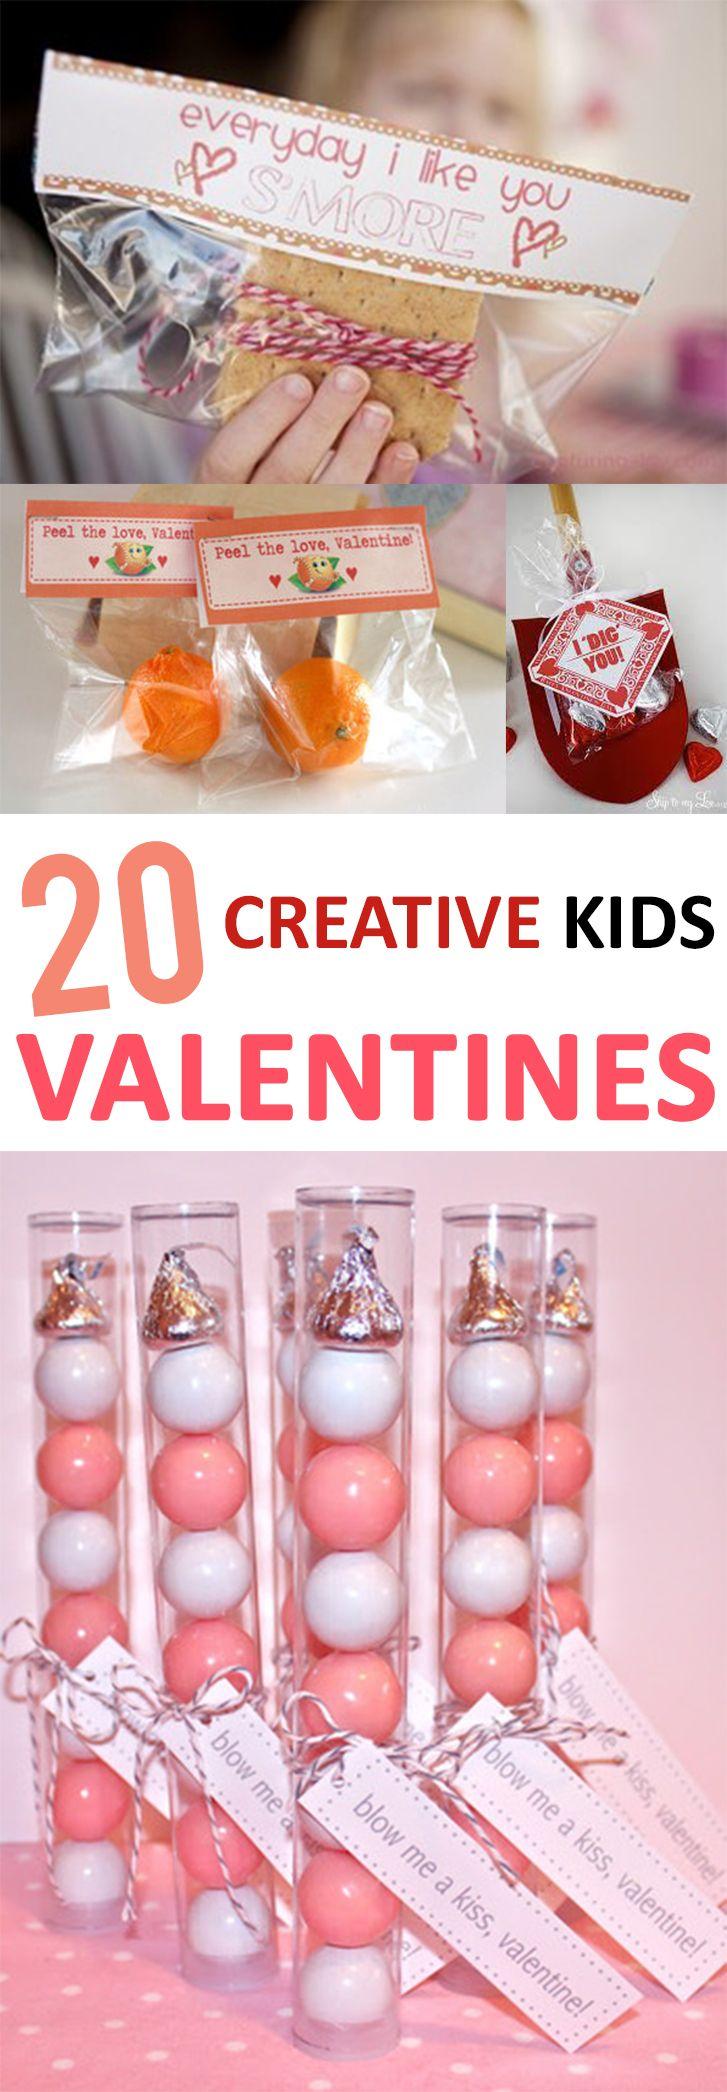 Unique ideas for your kid's Valentines.